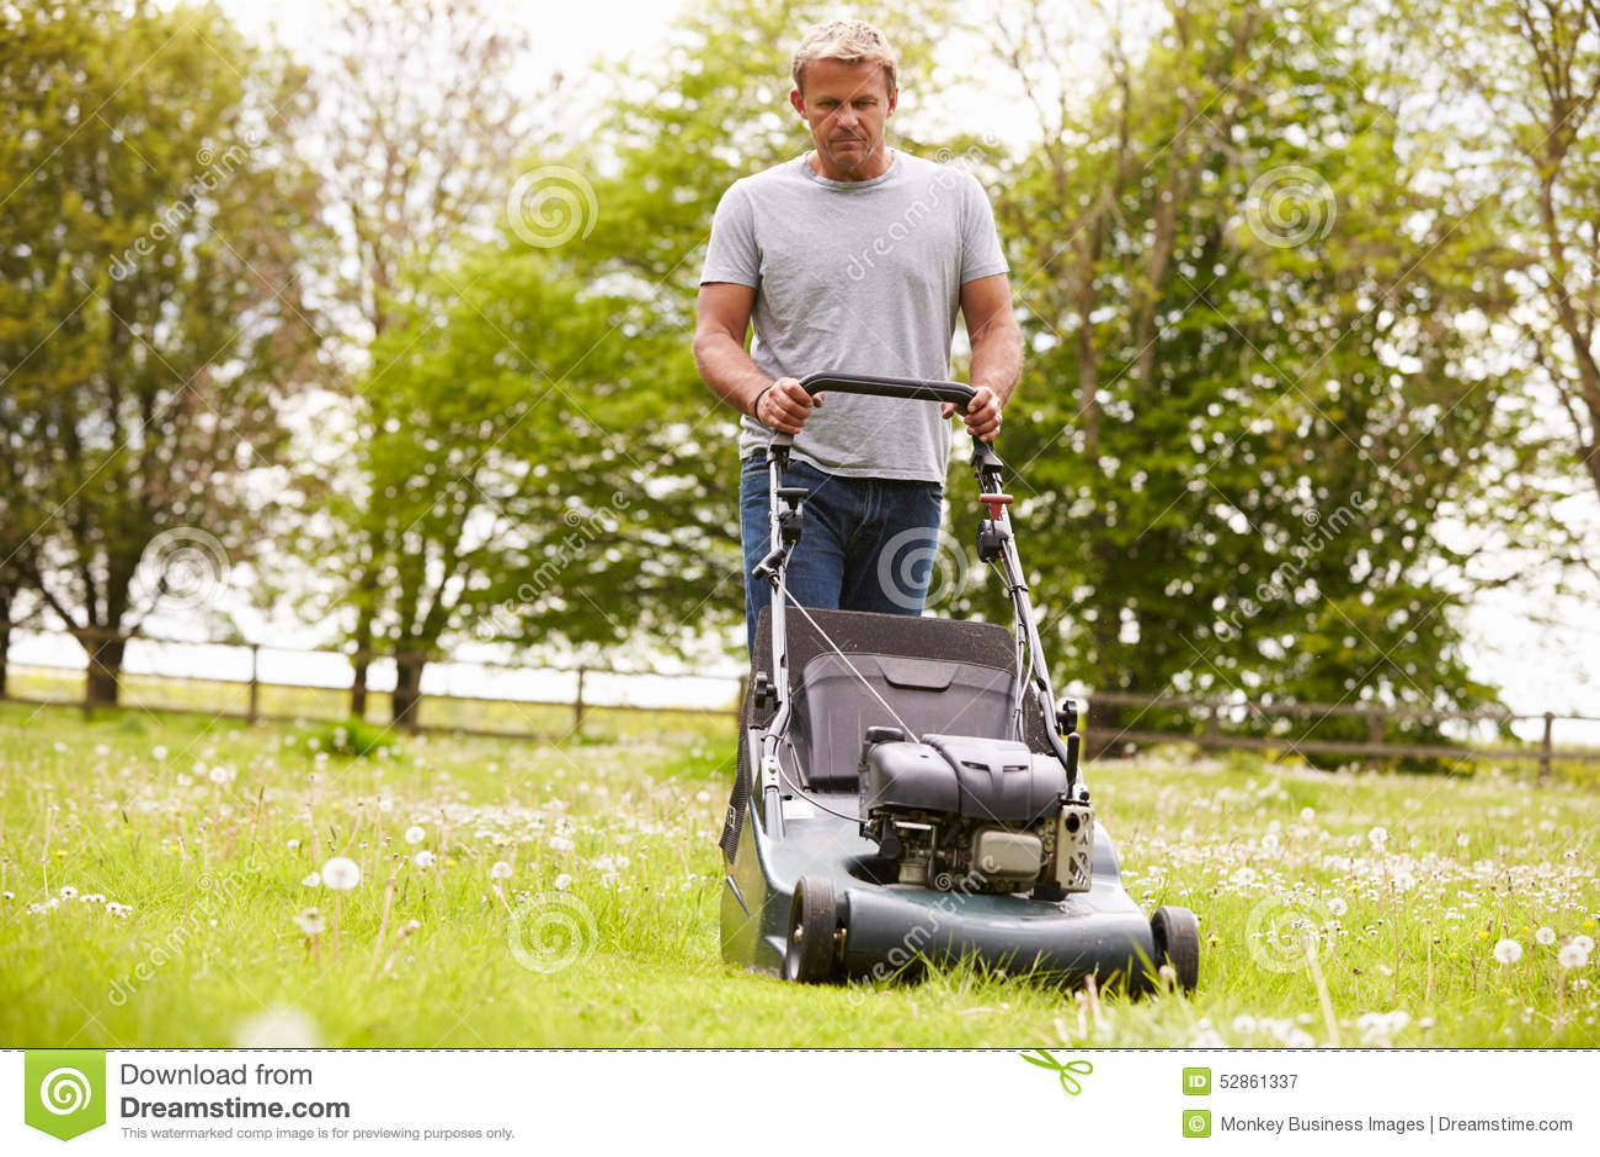 Man working in garden cutting grass with lawn mower stock for Lawn mower cutting grass